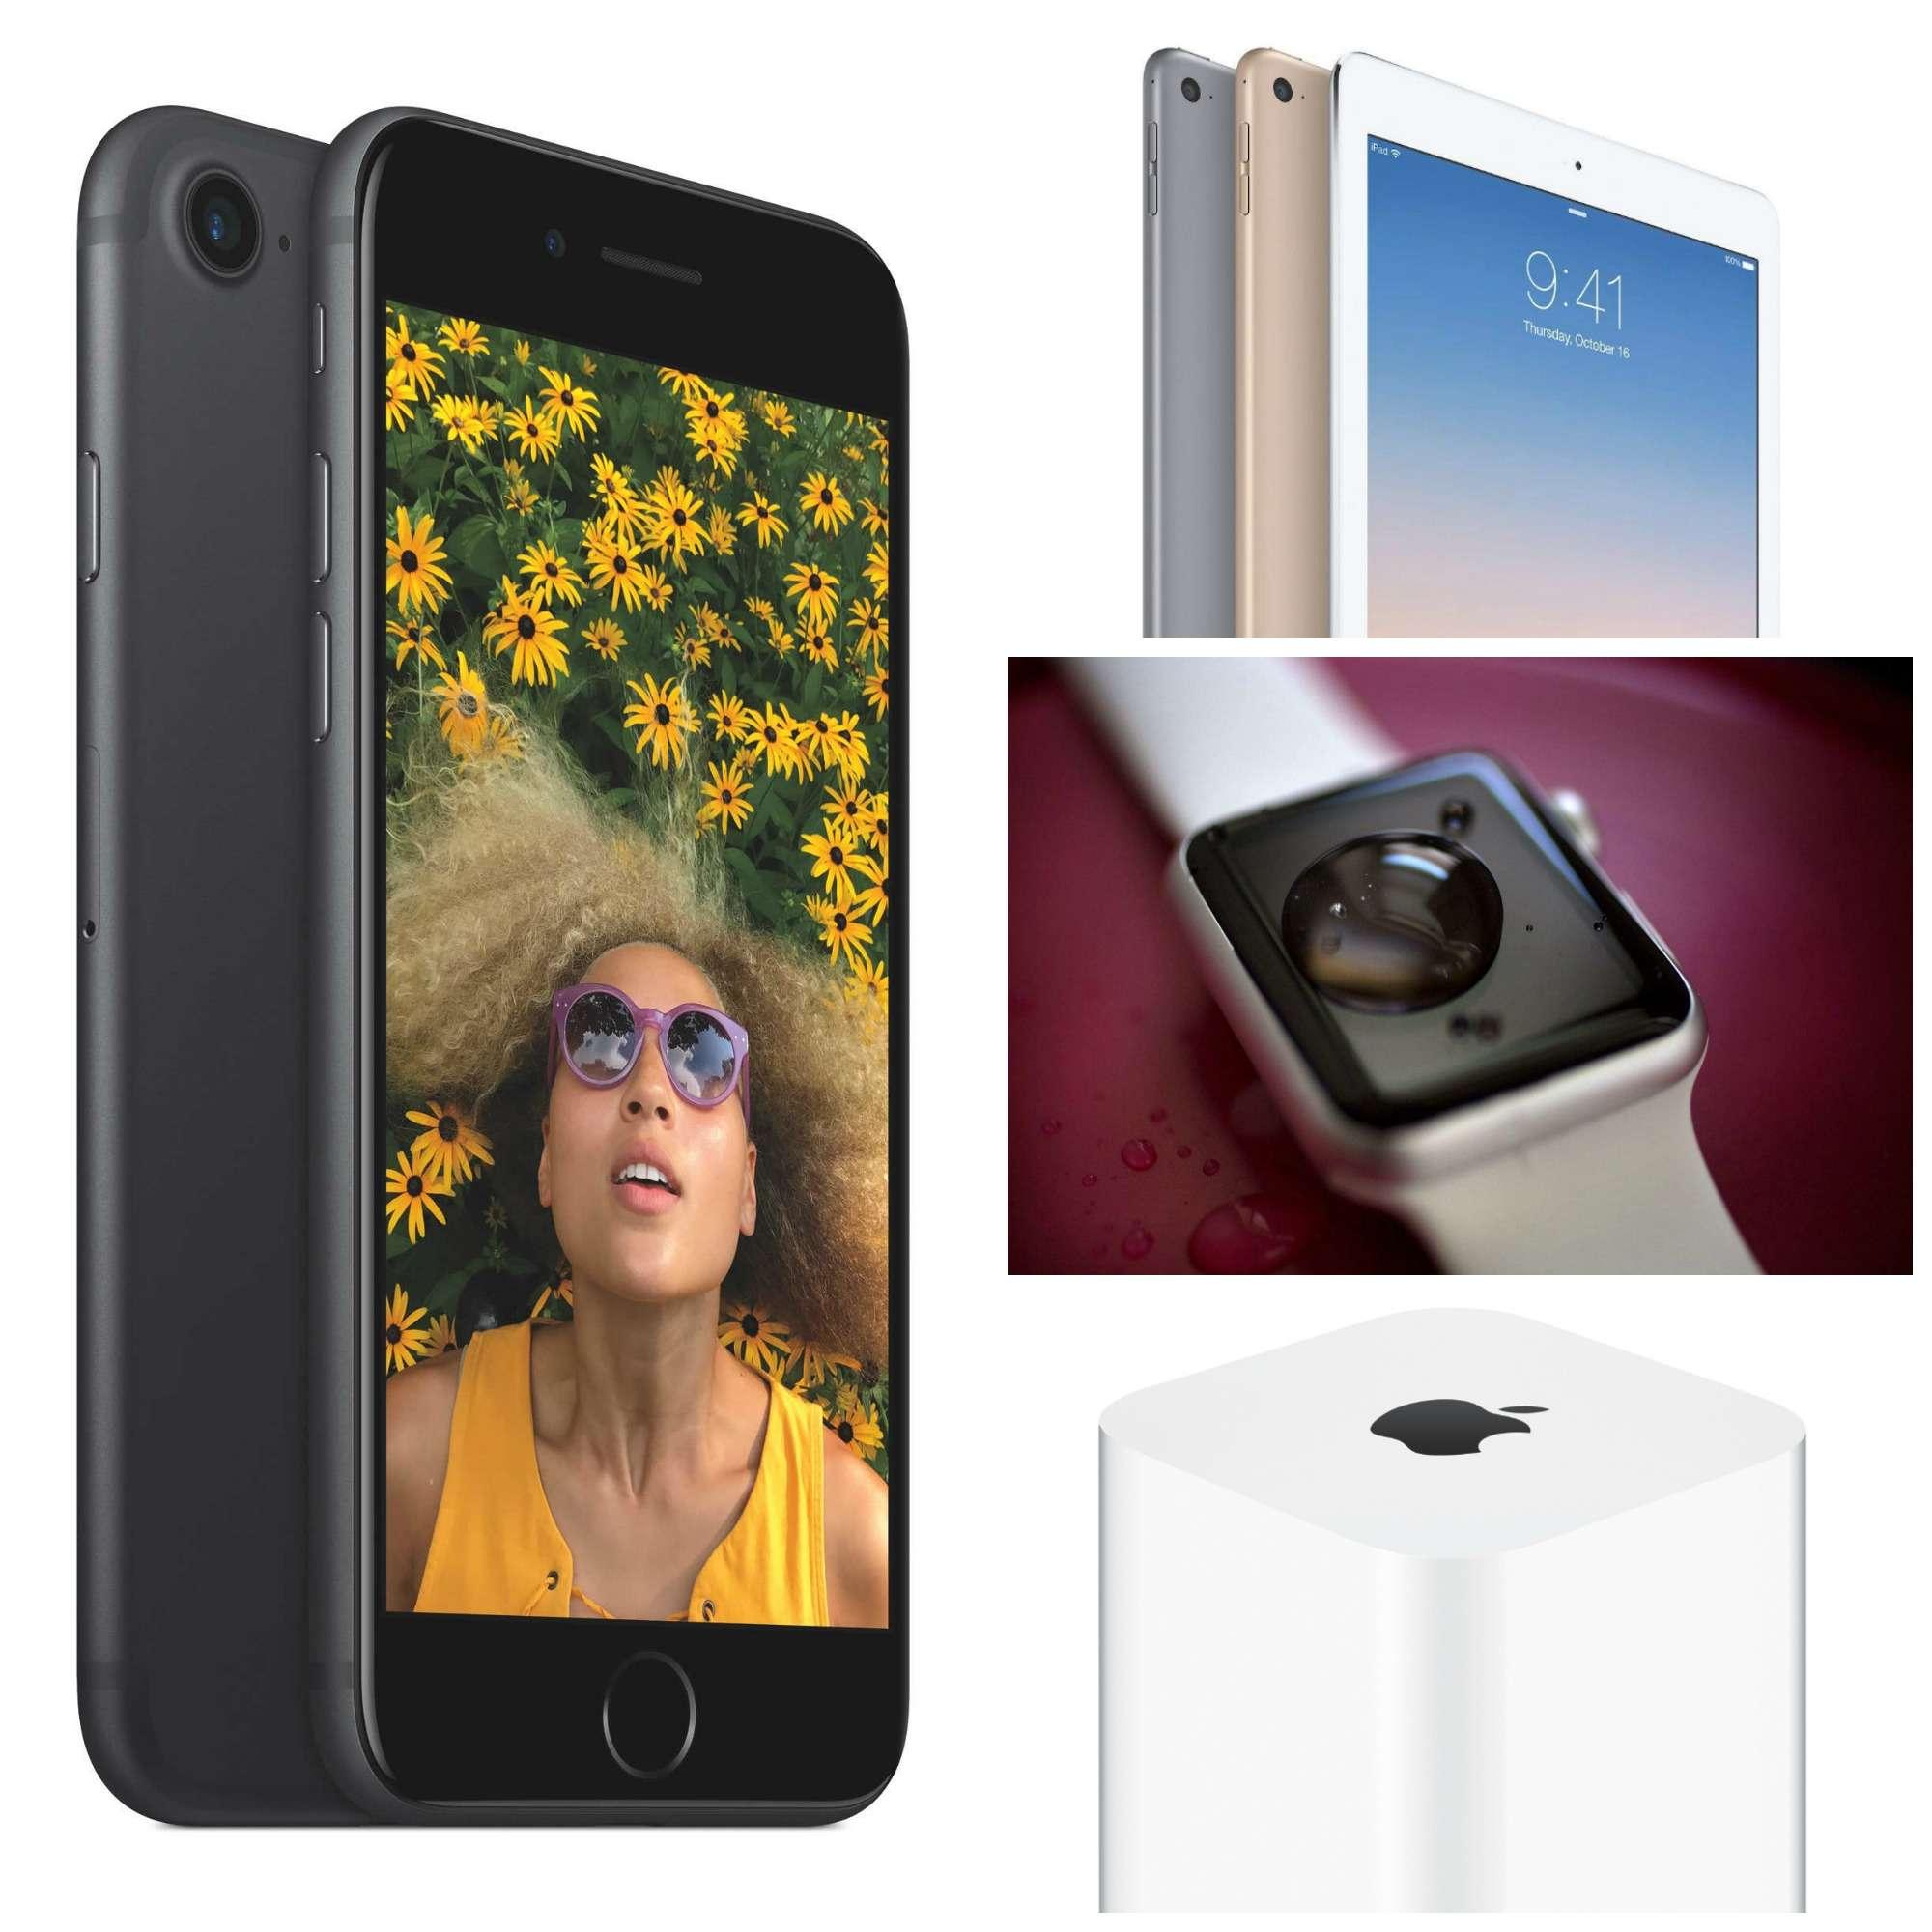 week's best Apple deals